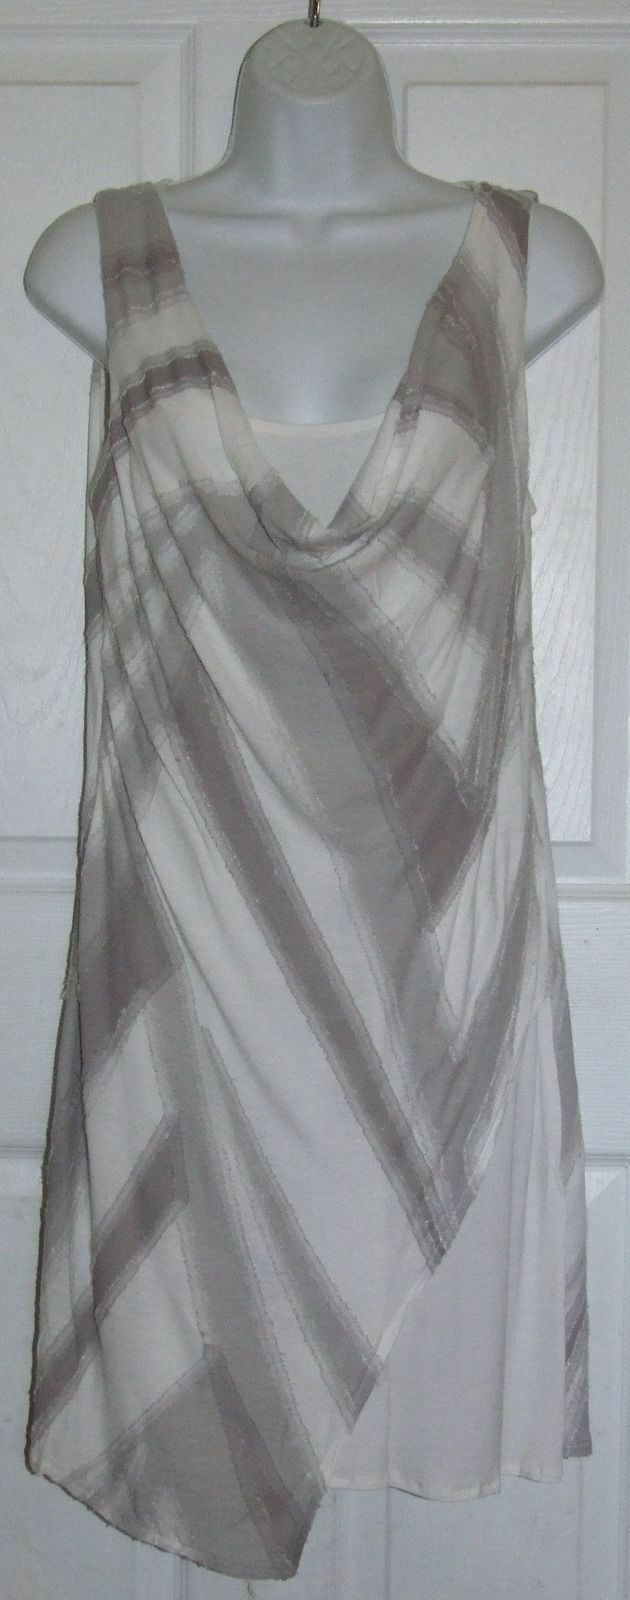 Ronen Chen Paloma Tunic Cream & Brown Dress